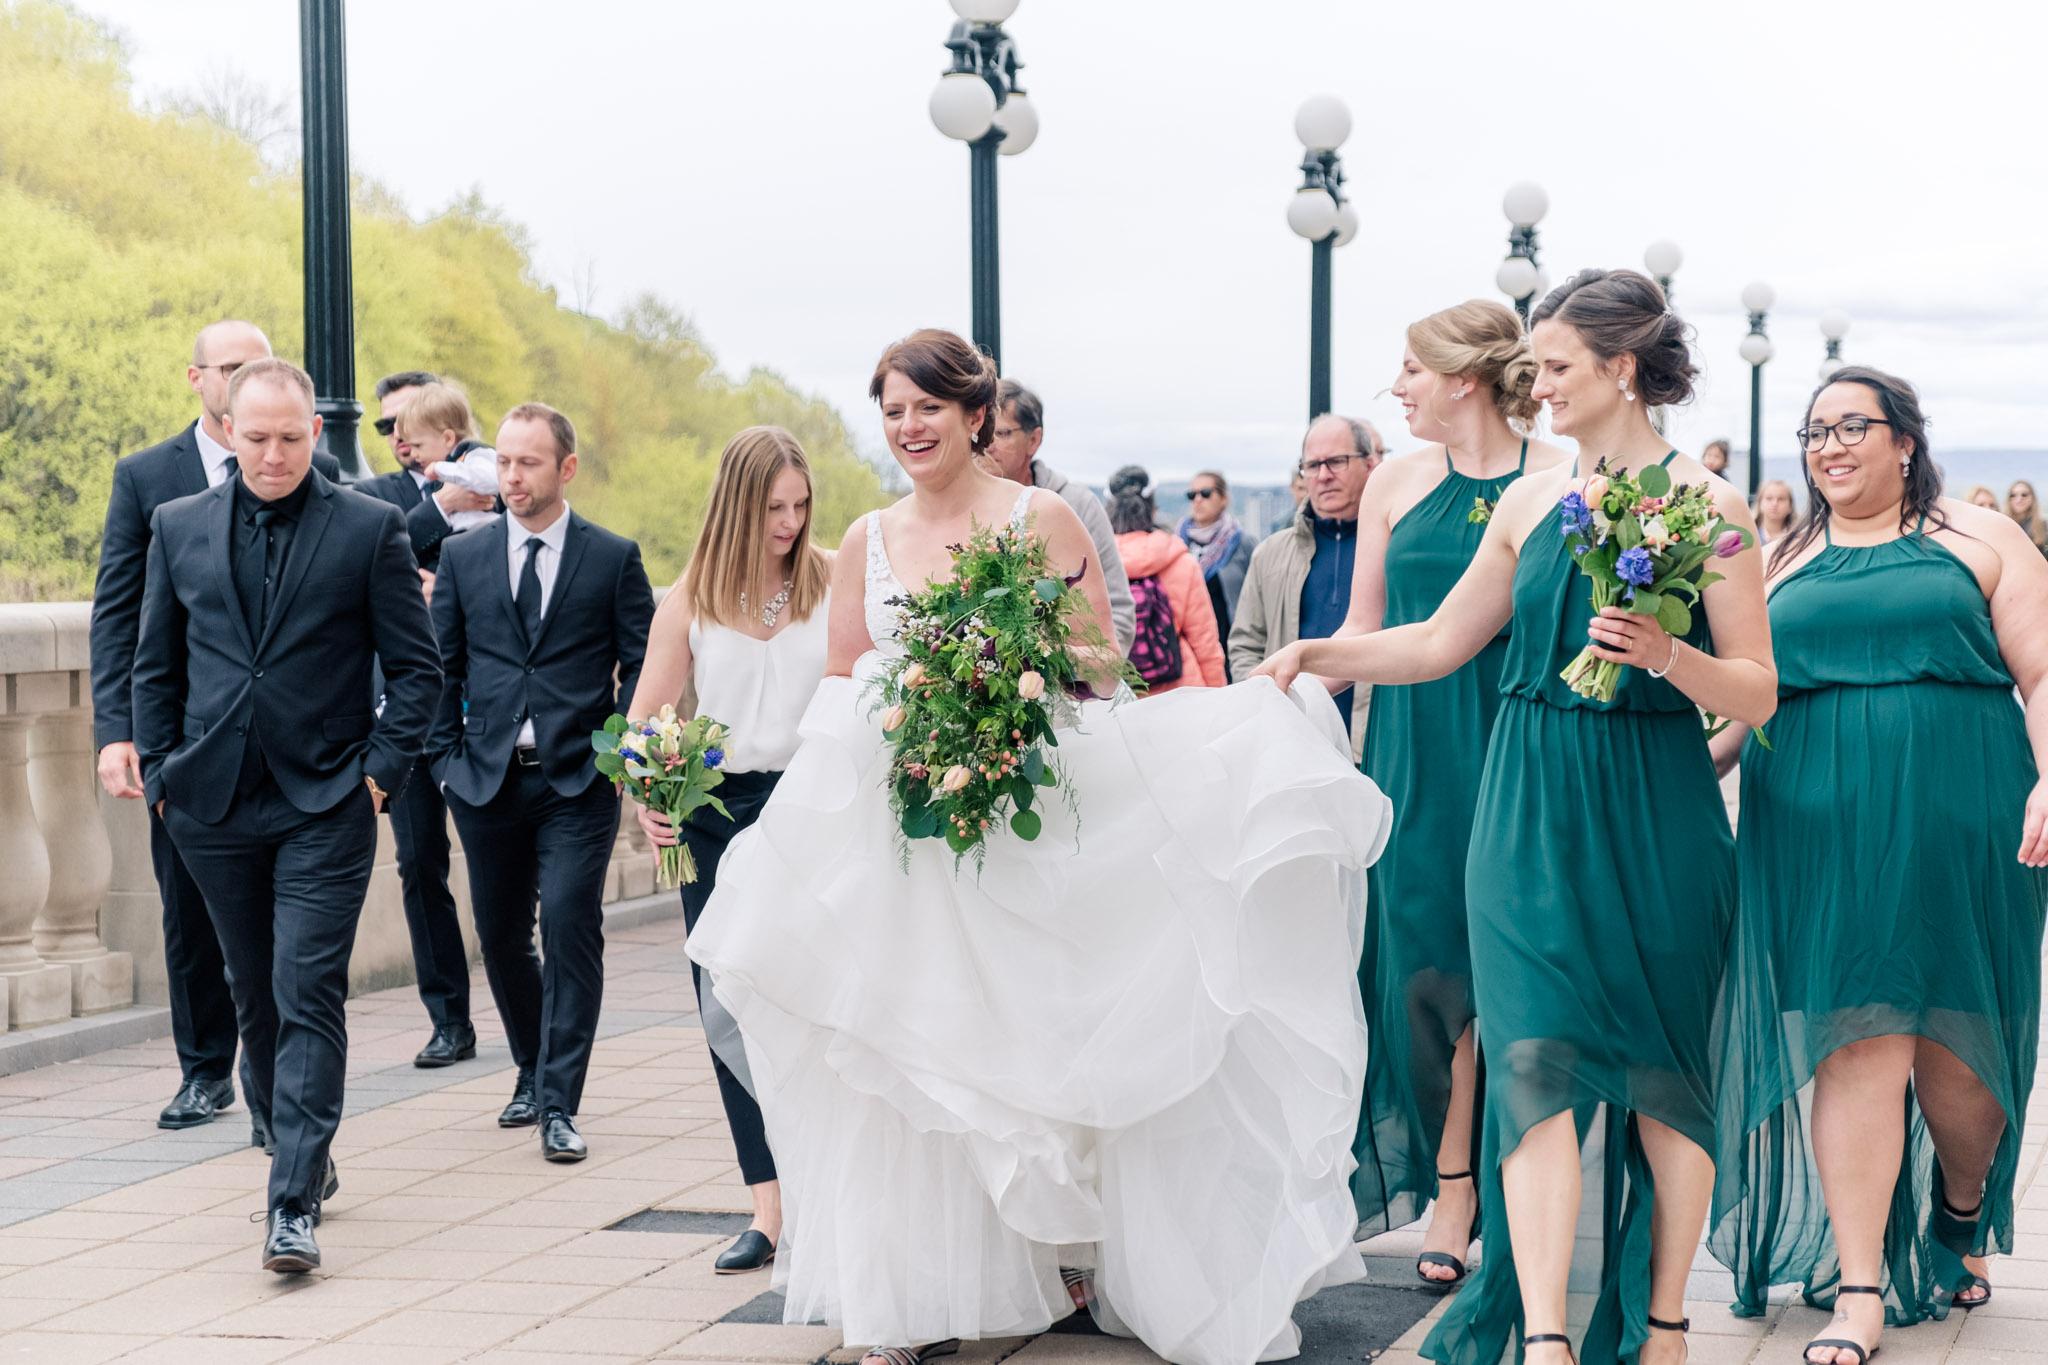 NAC-wedding-Ottawa-photographer-6901.JPG